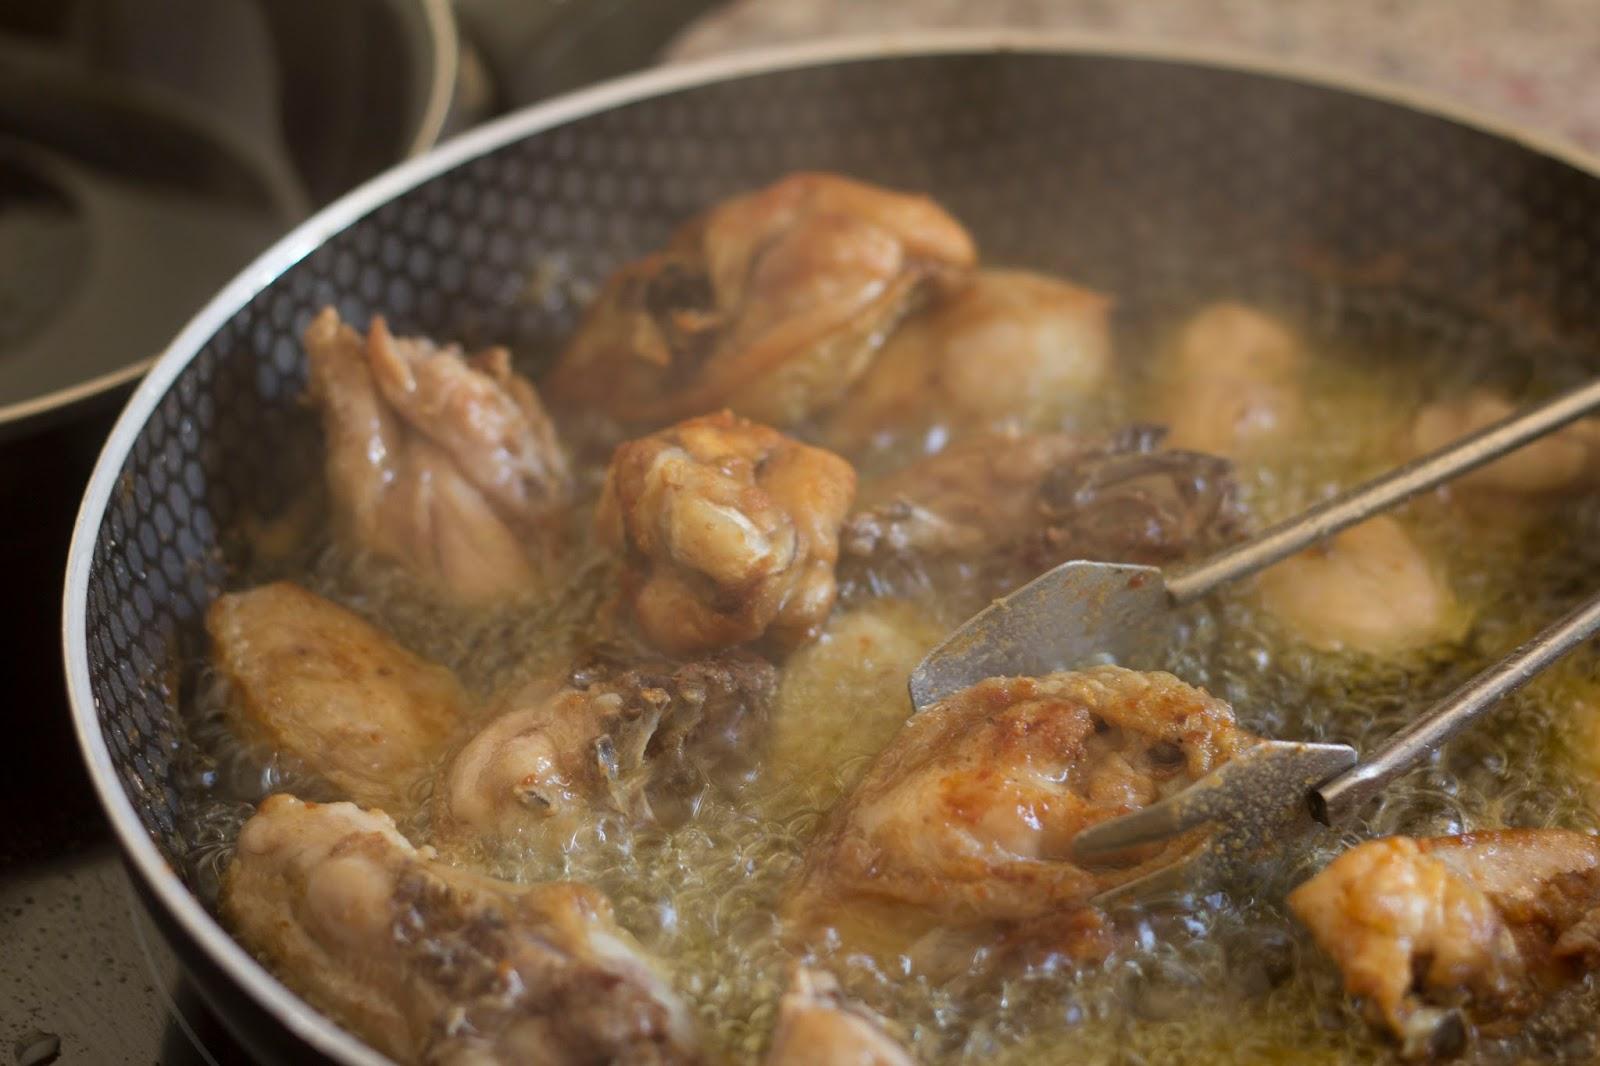 Pollo al ajillo receta tradicional 2mandarinas en mi cocina - Cocinar pollo al ajillo ...